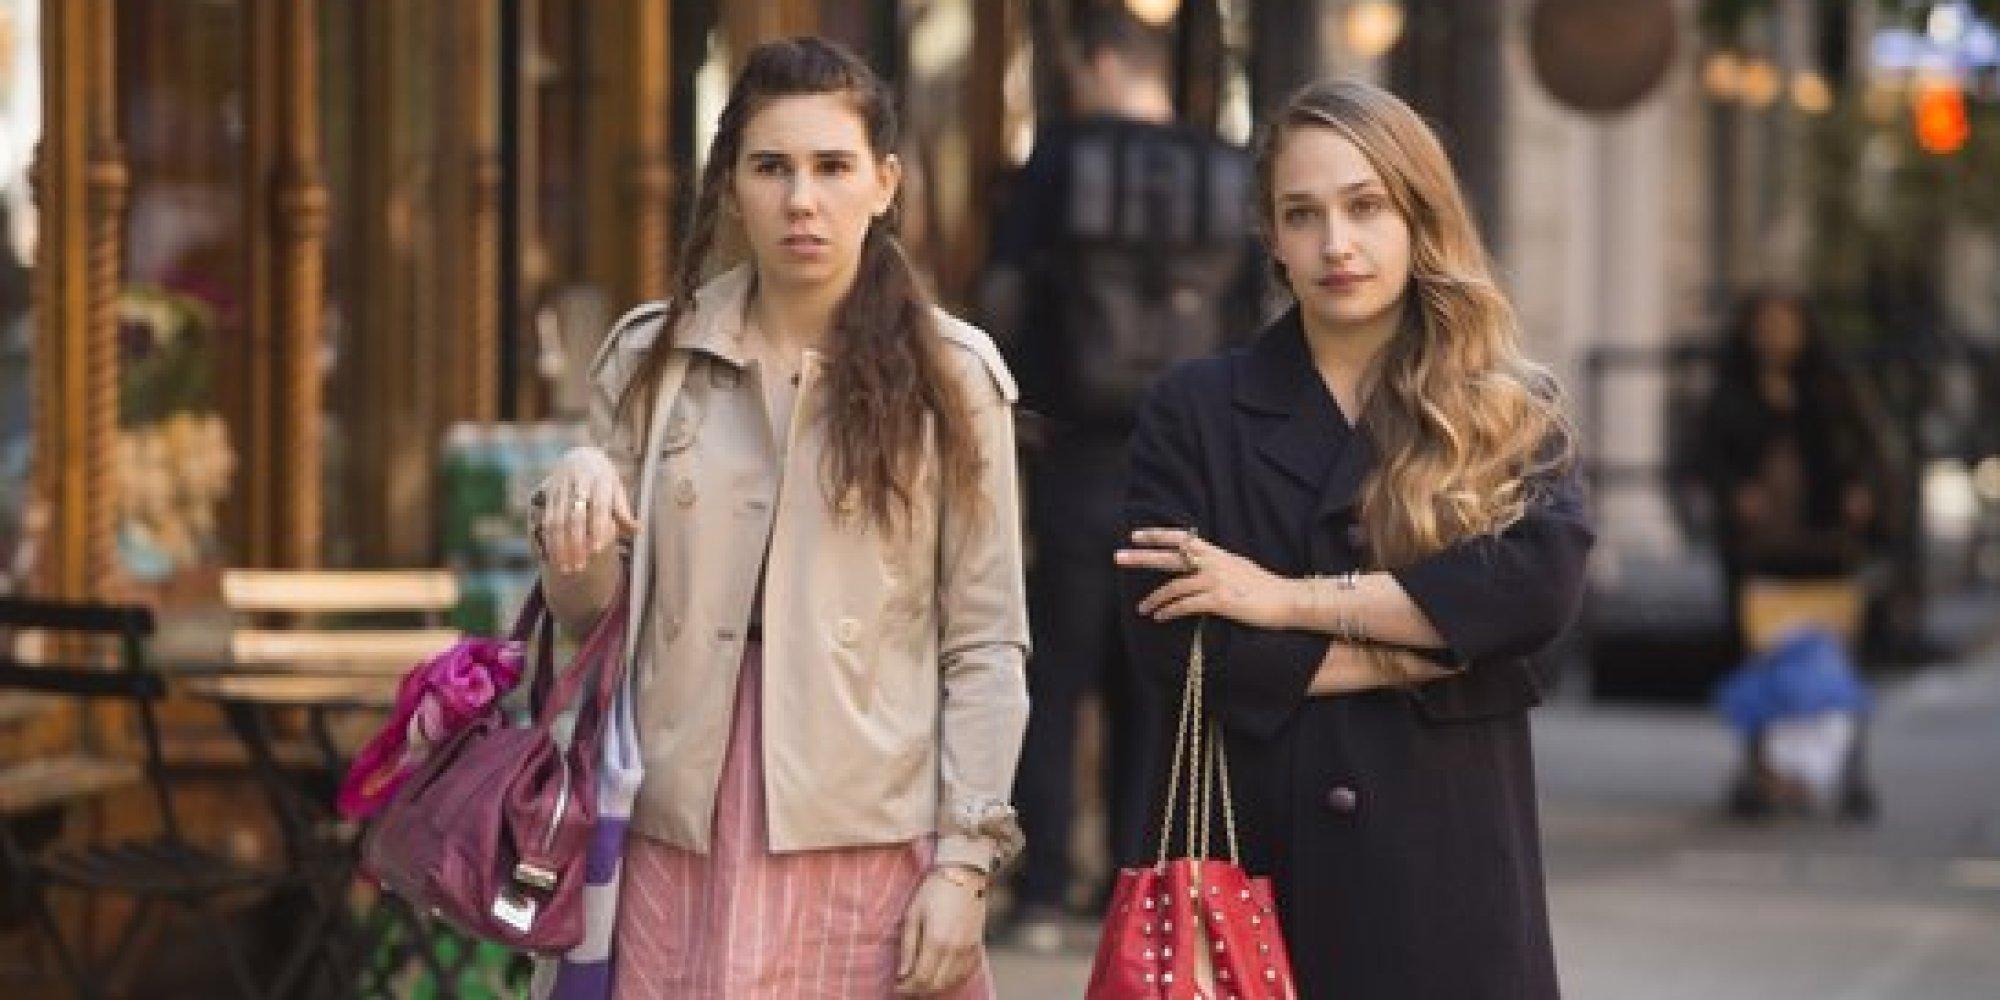 o-GIRLS-HBO-facebook